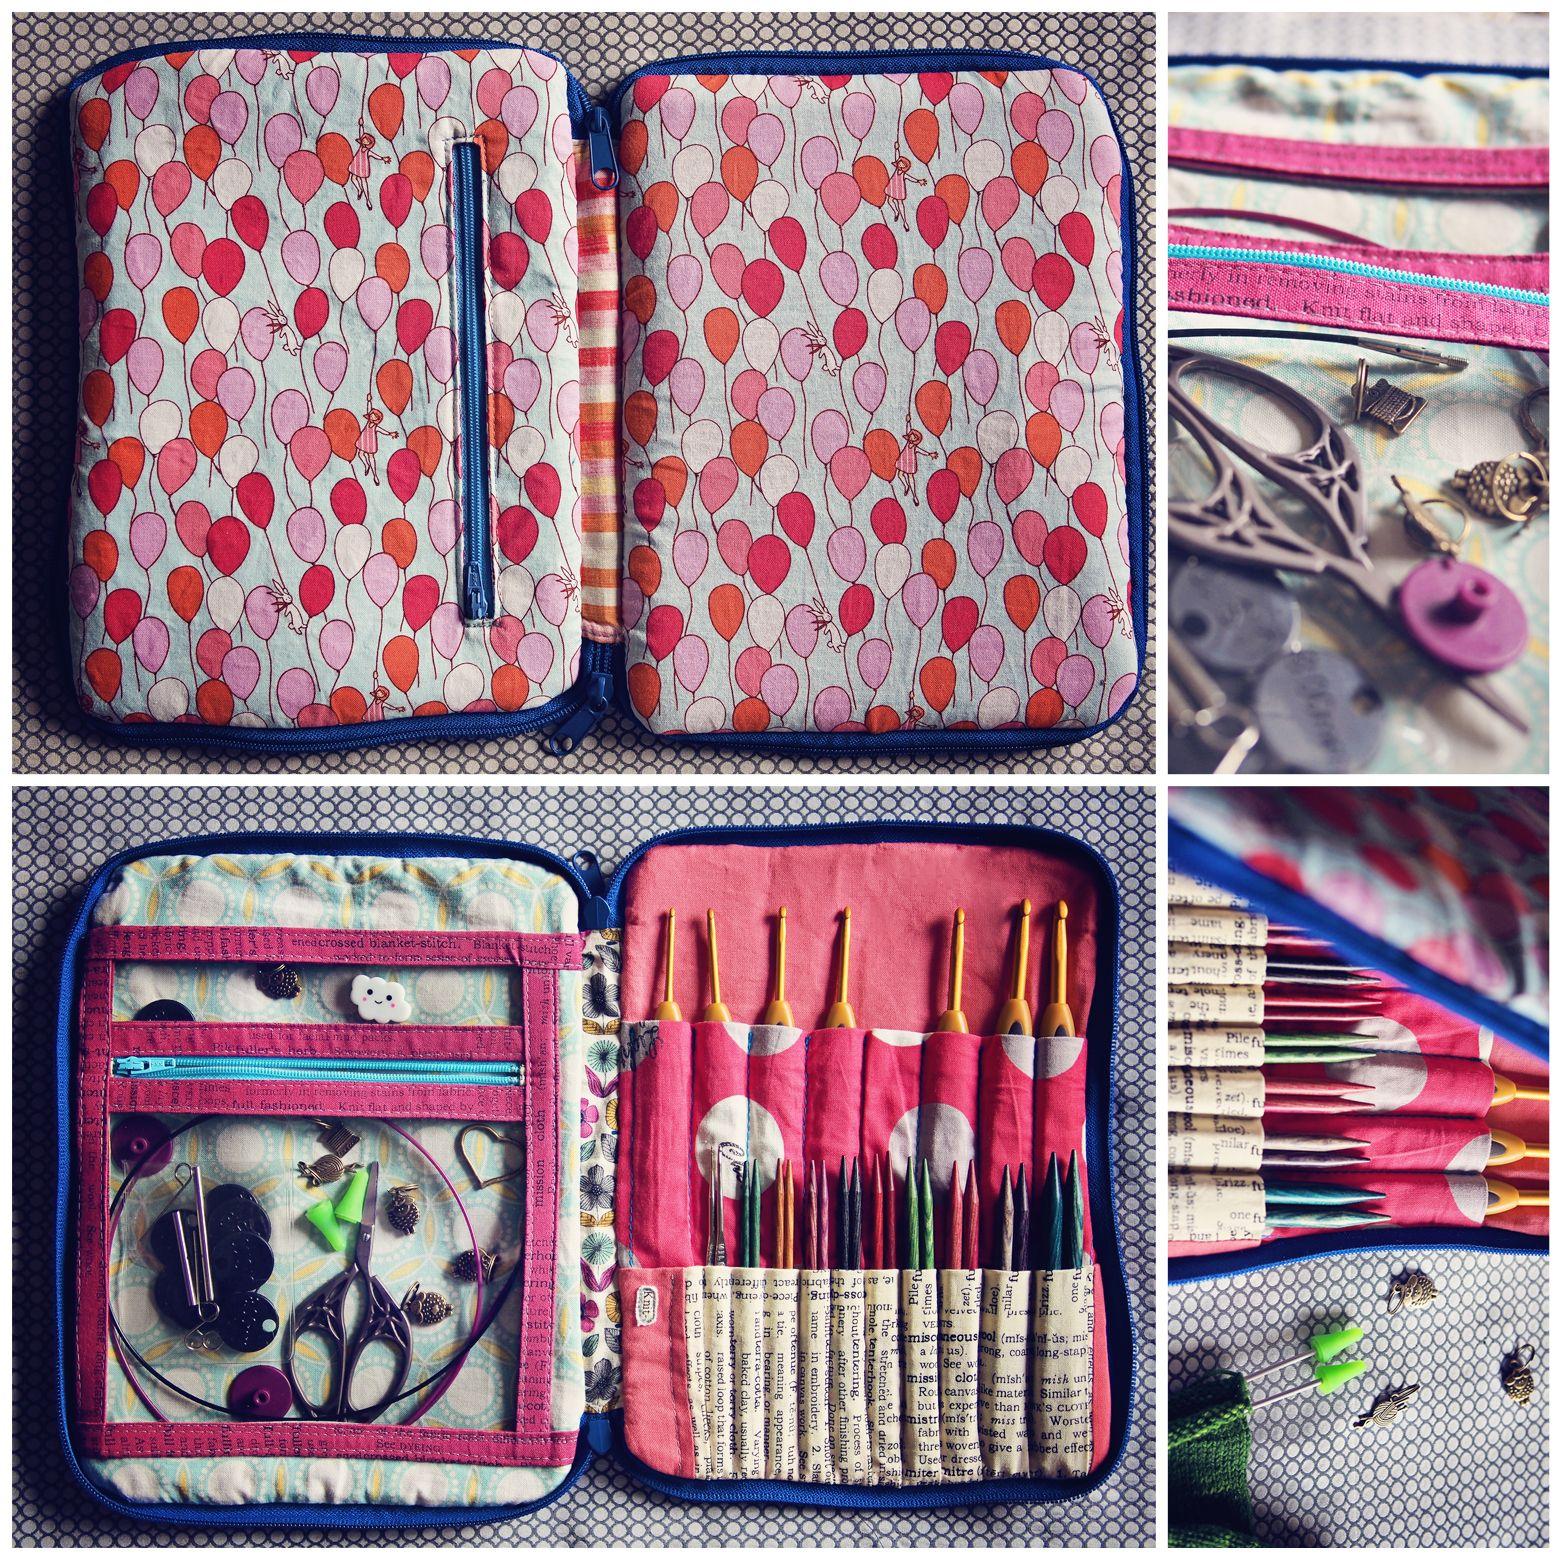 Creative Maker Supply Case | Knitting needle case, Diy ...